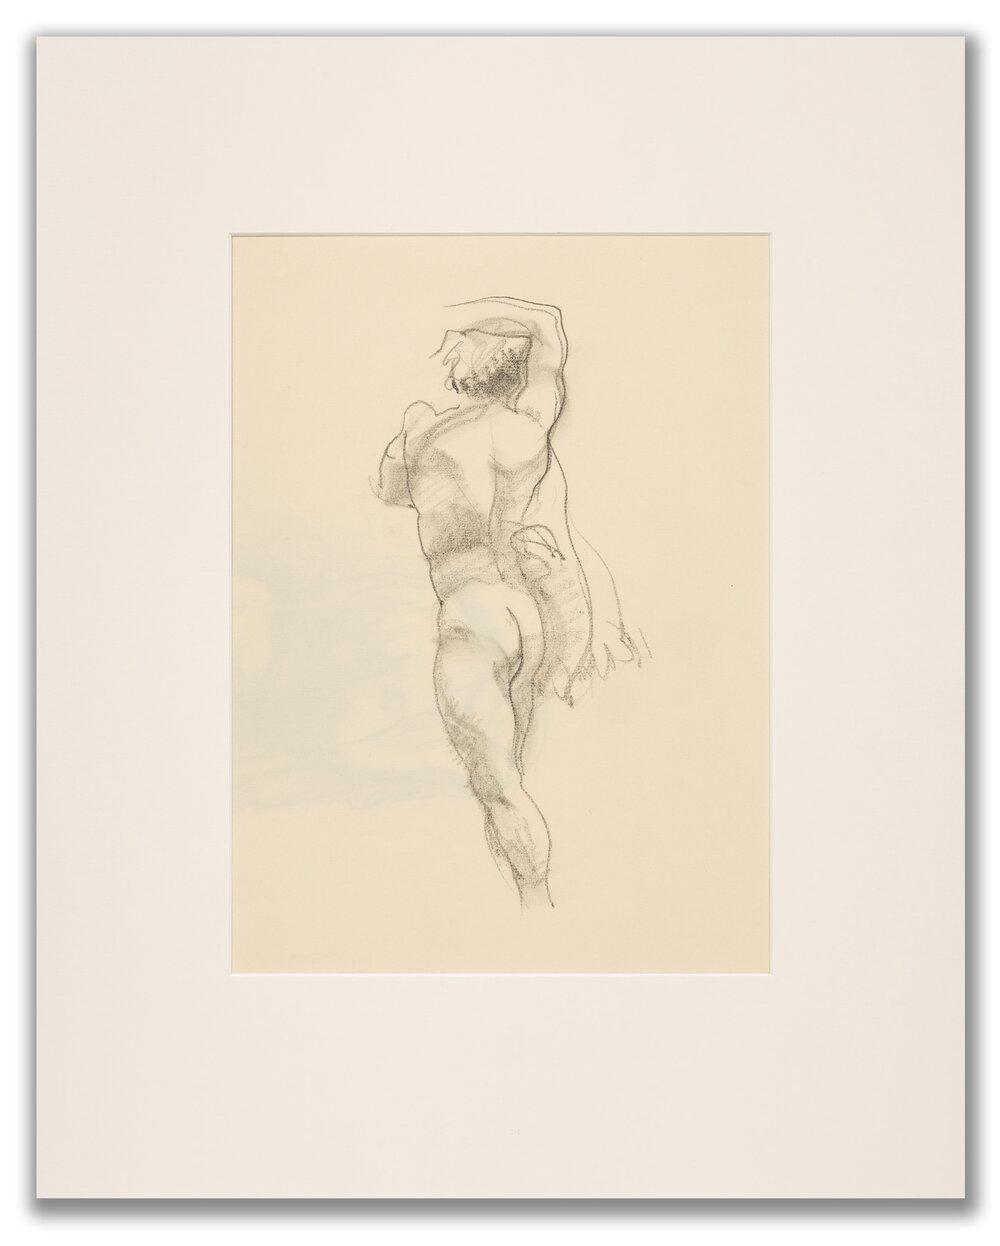 Michael Leonard, (British b.1933), Dancer with a towel; back view, c.1980.